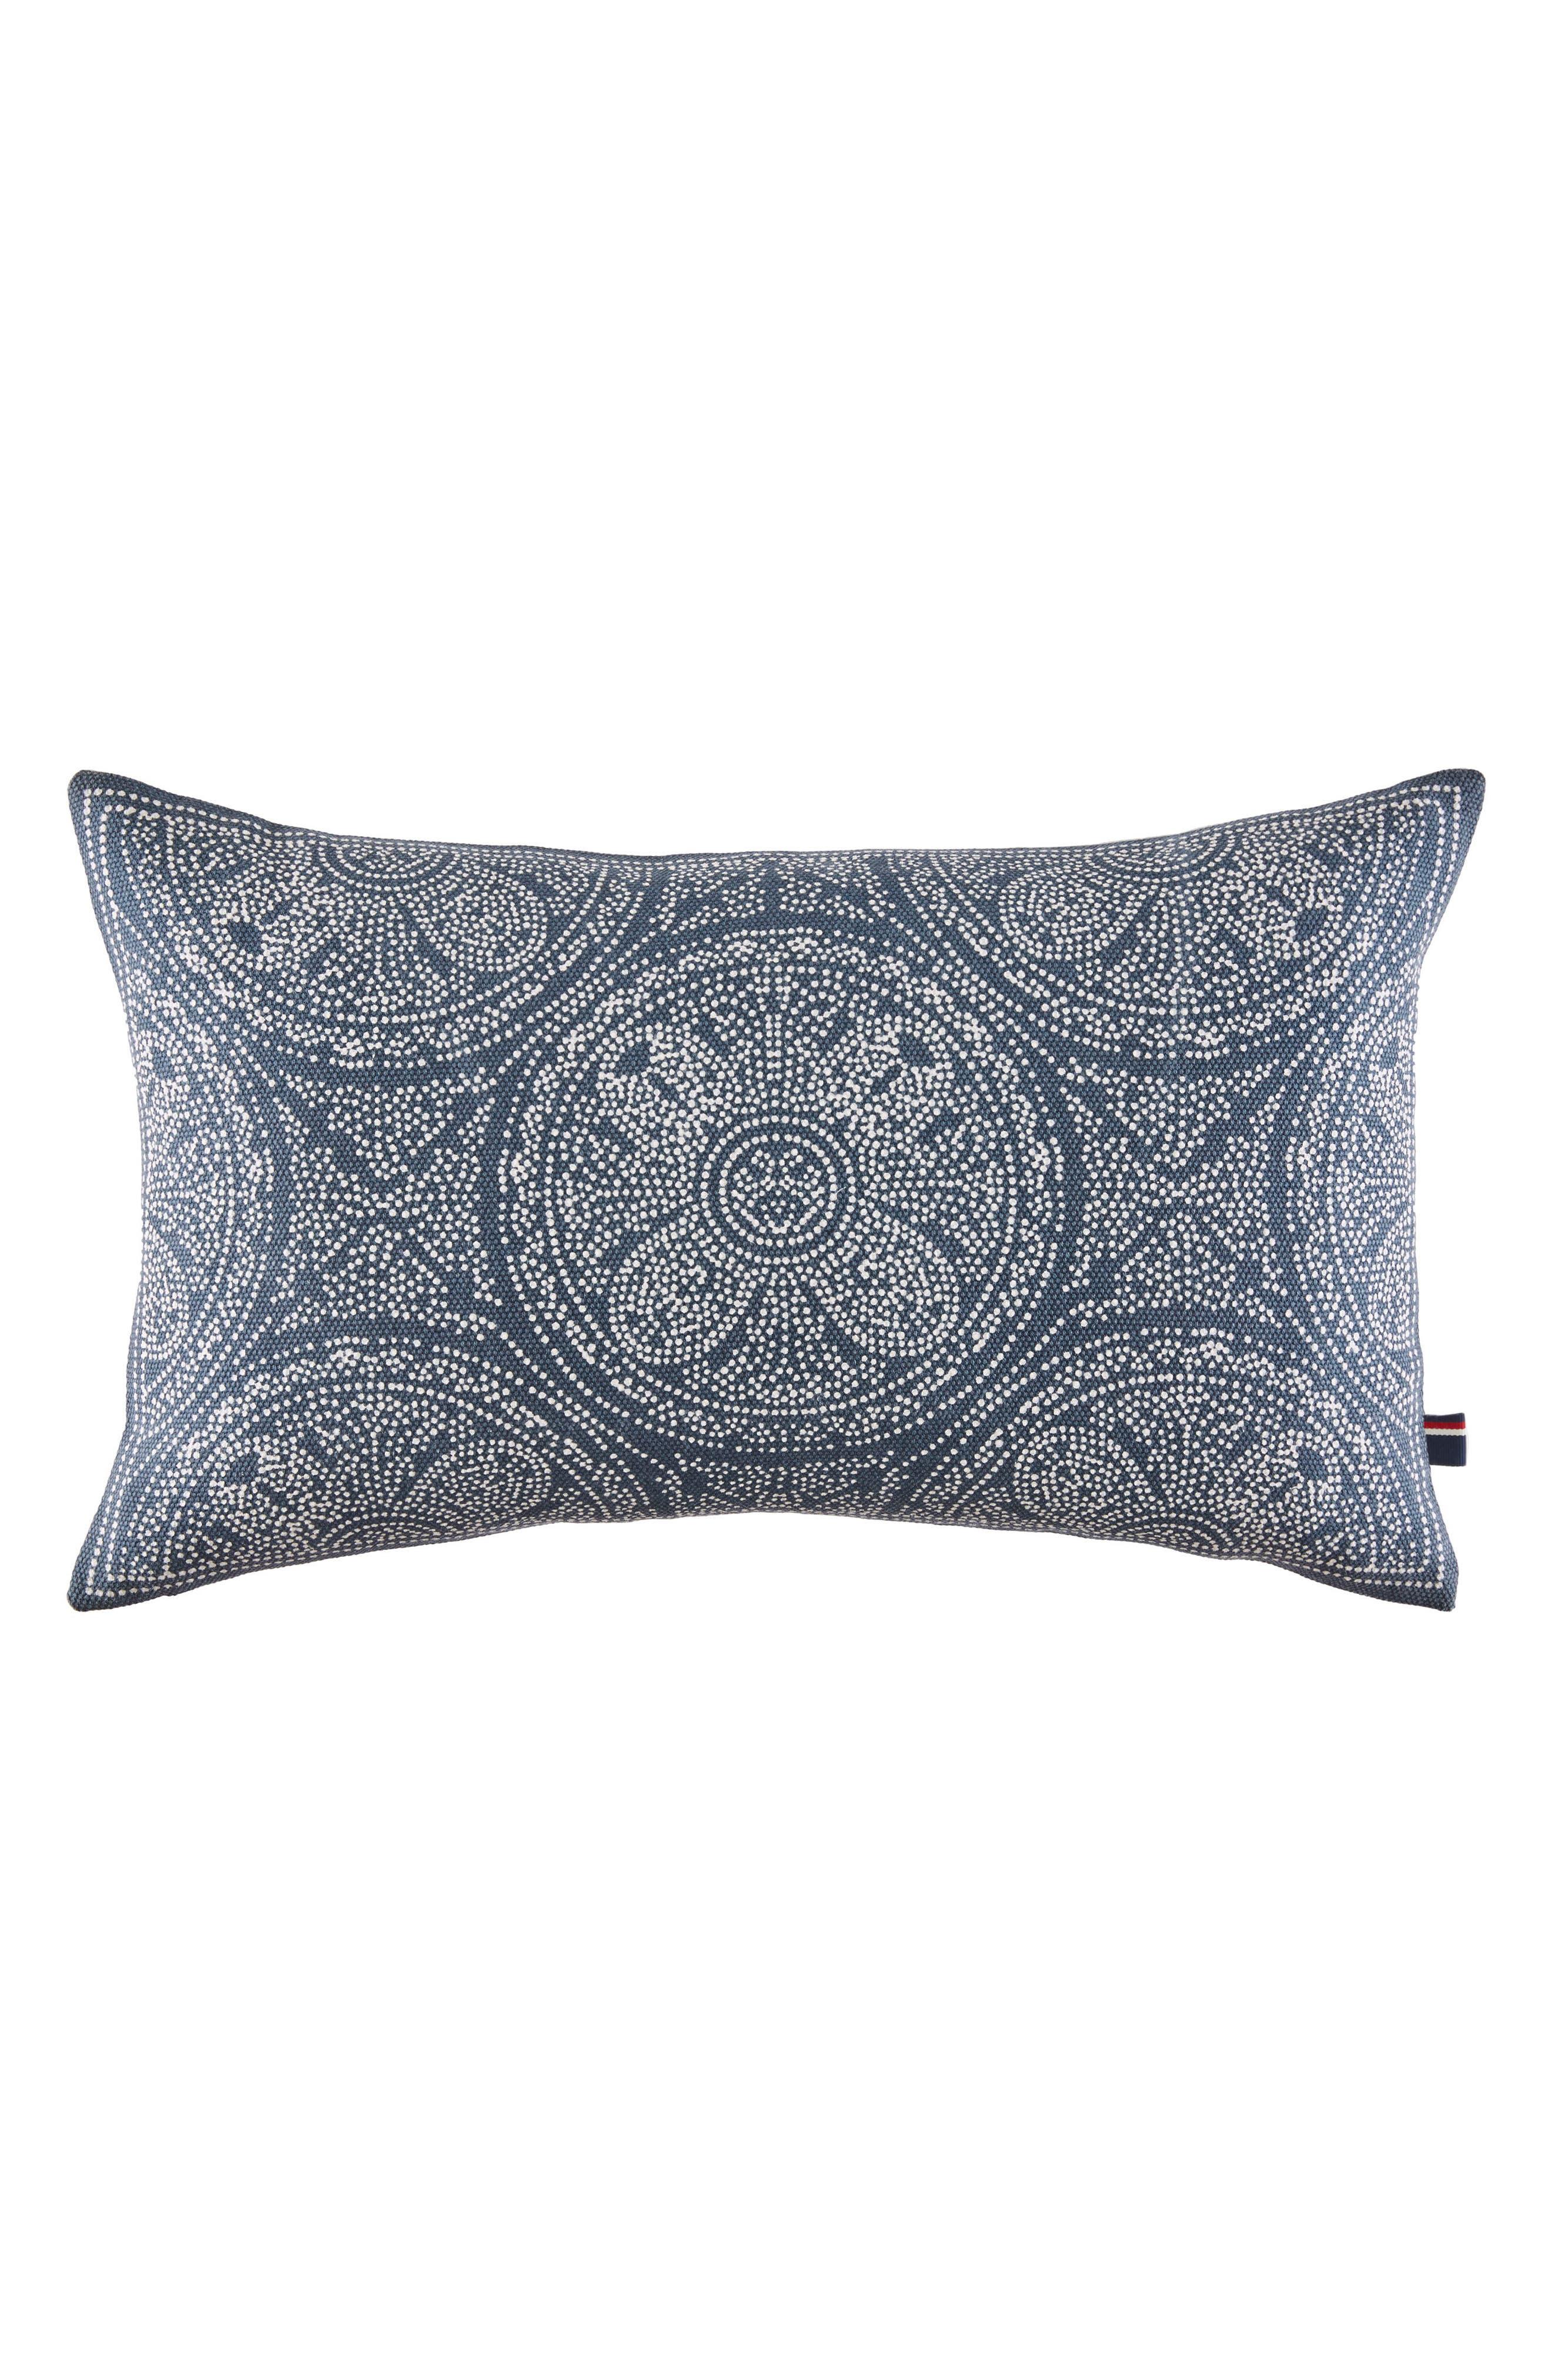 Batik Indigo Accent Pillow,                         Main,                         color, 415